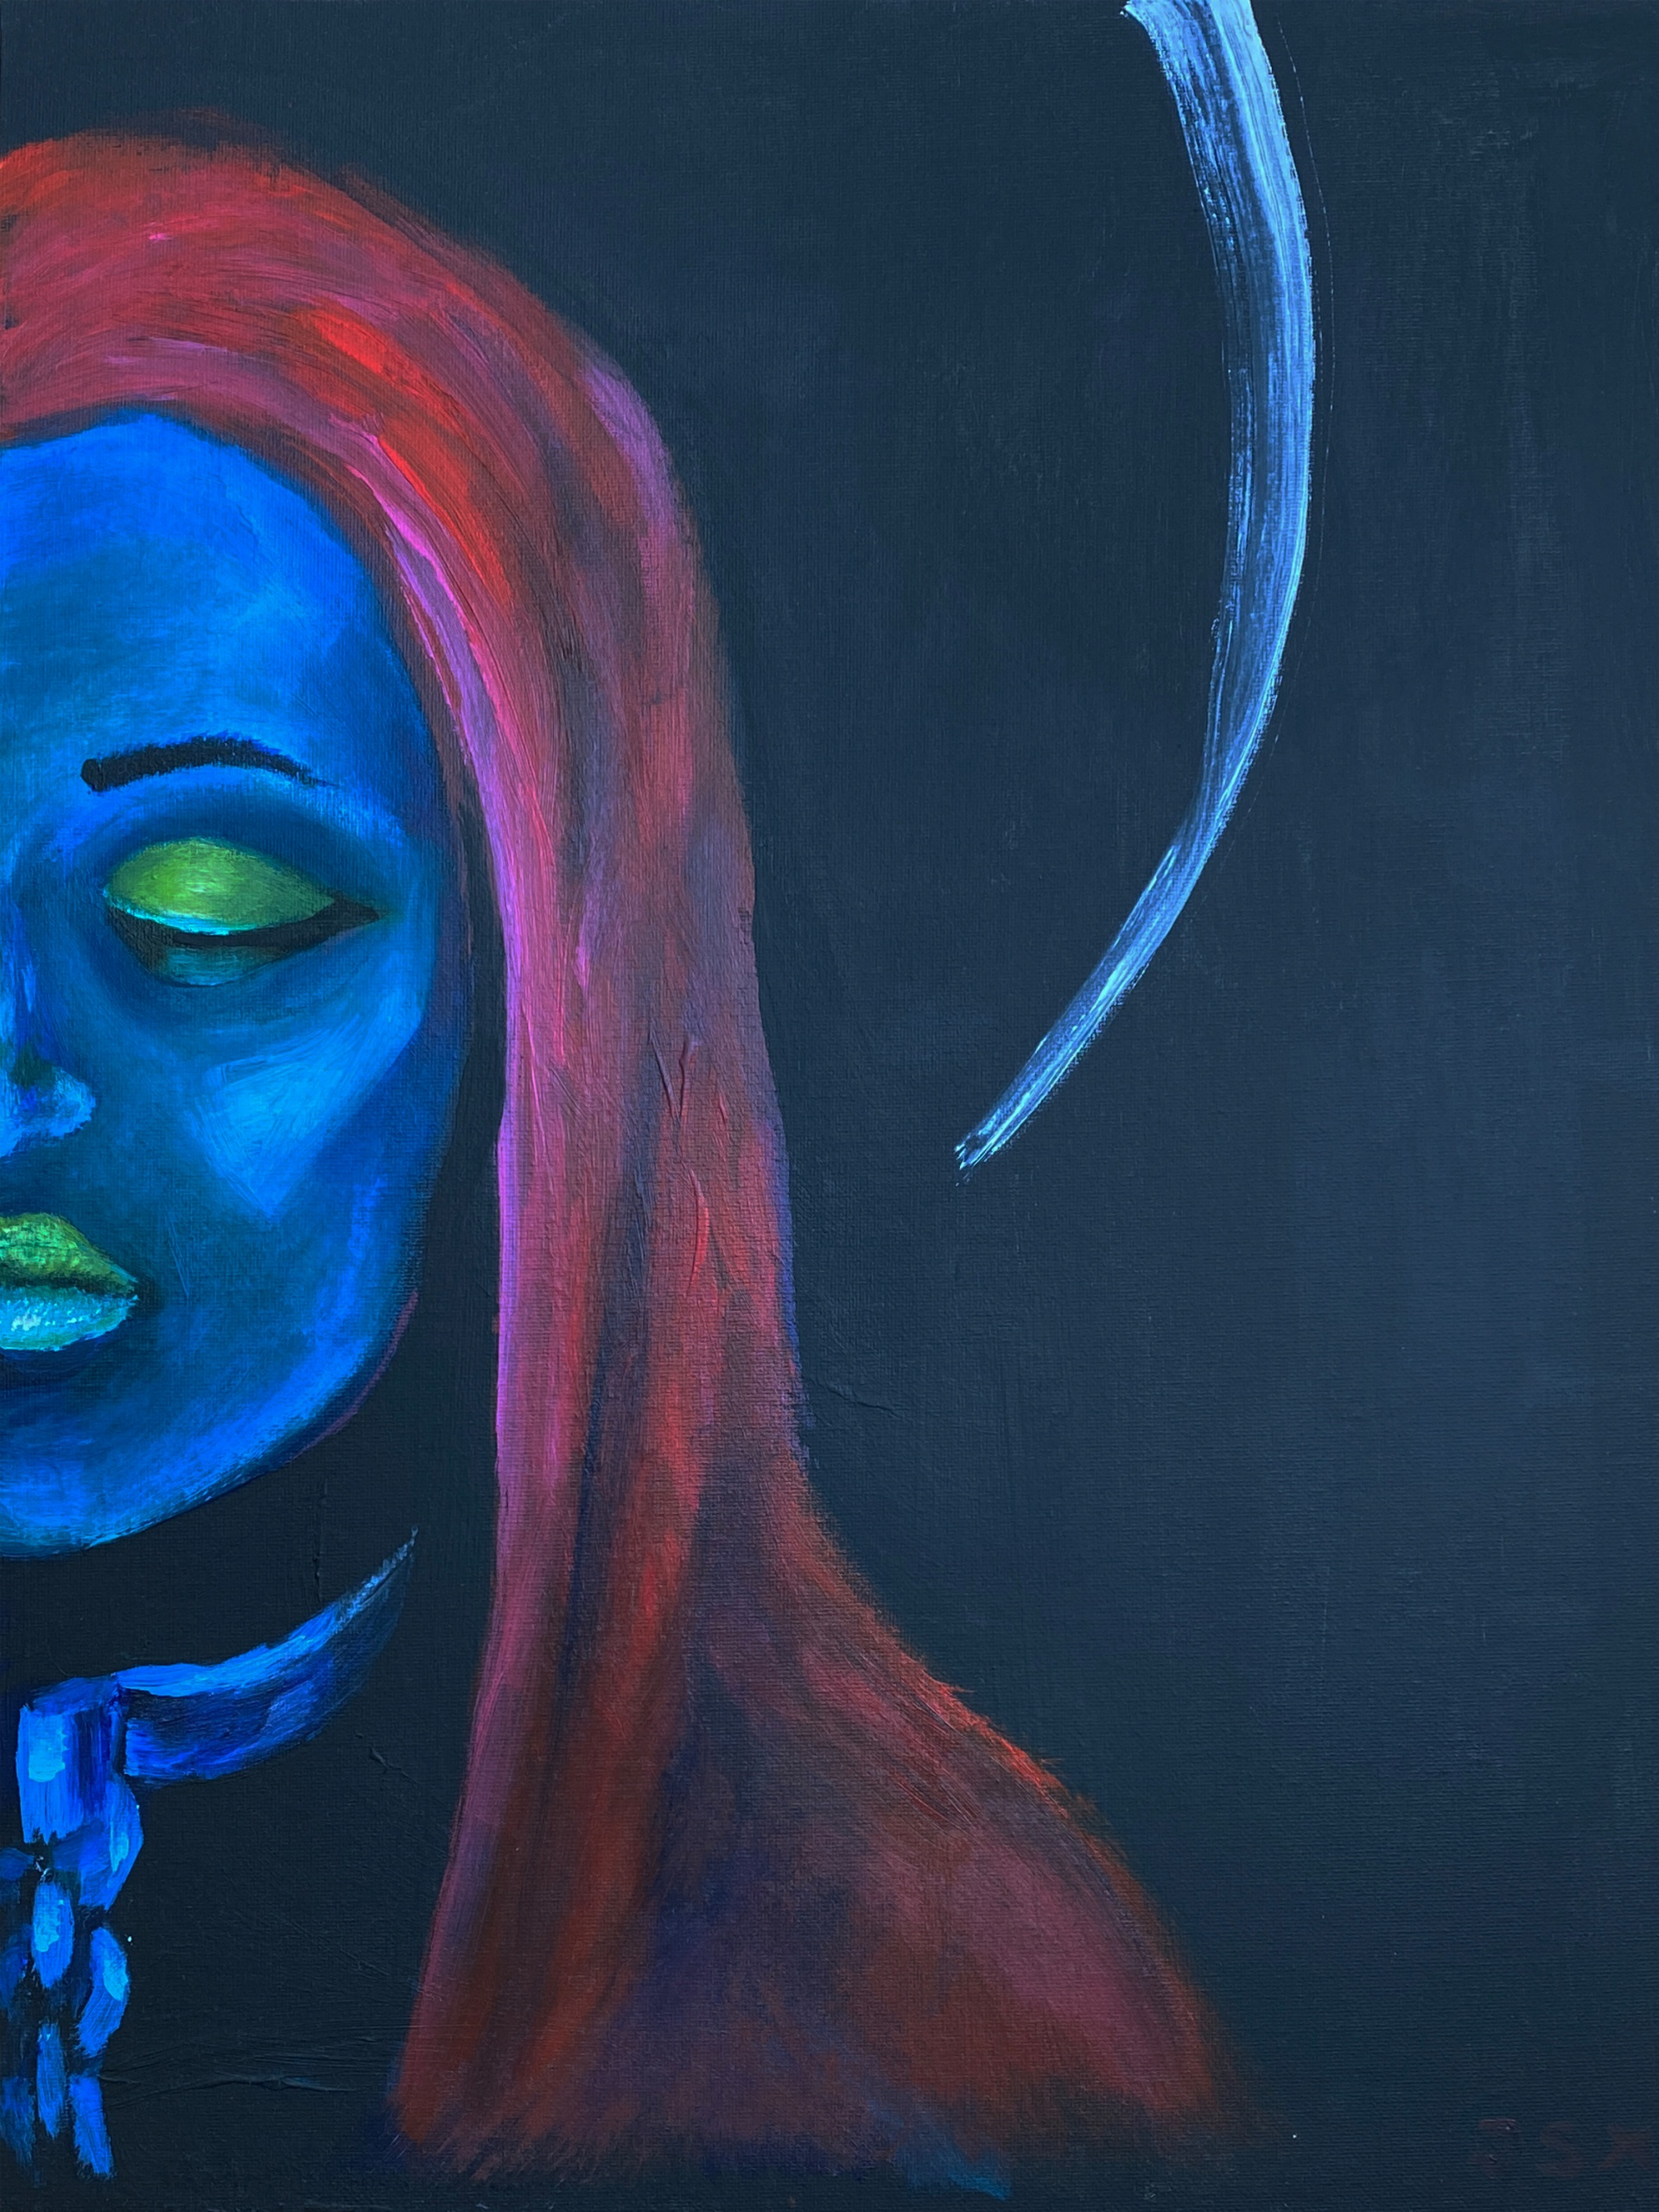 Face_4 artwork by J.Stix